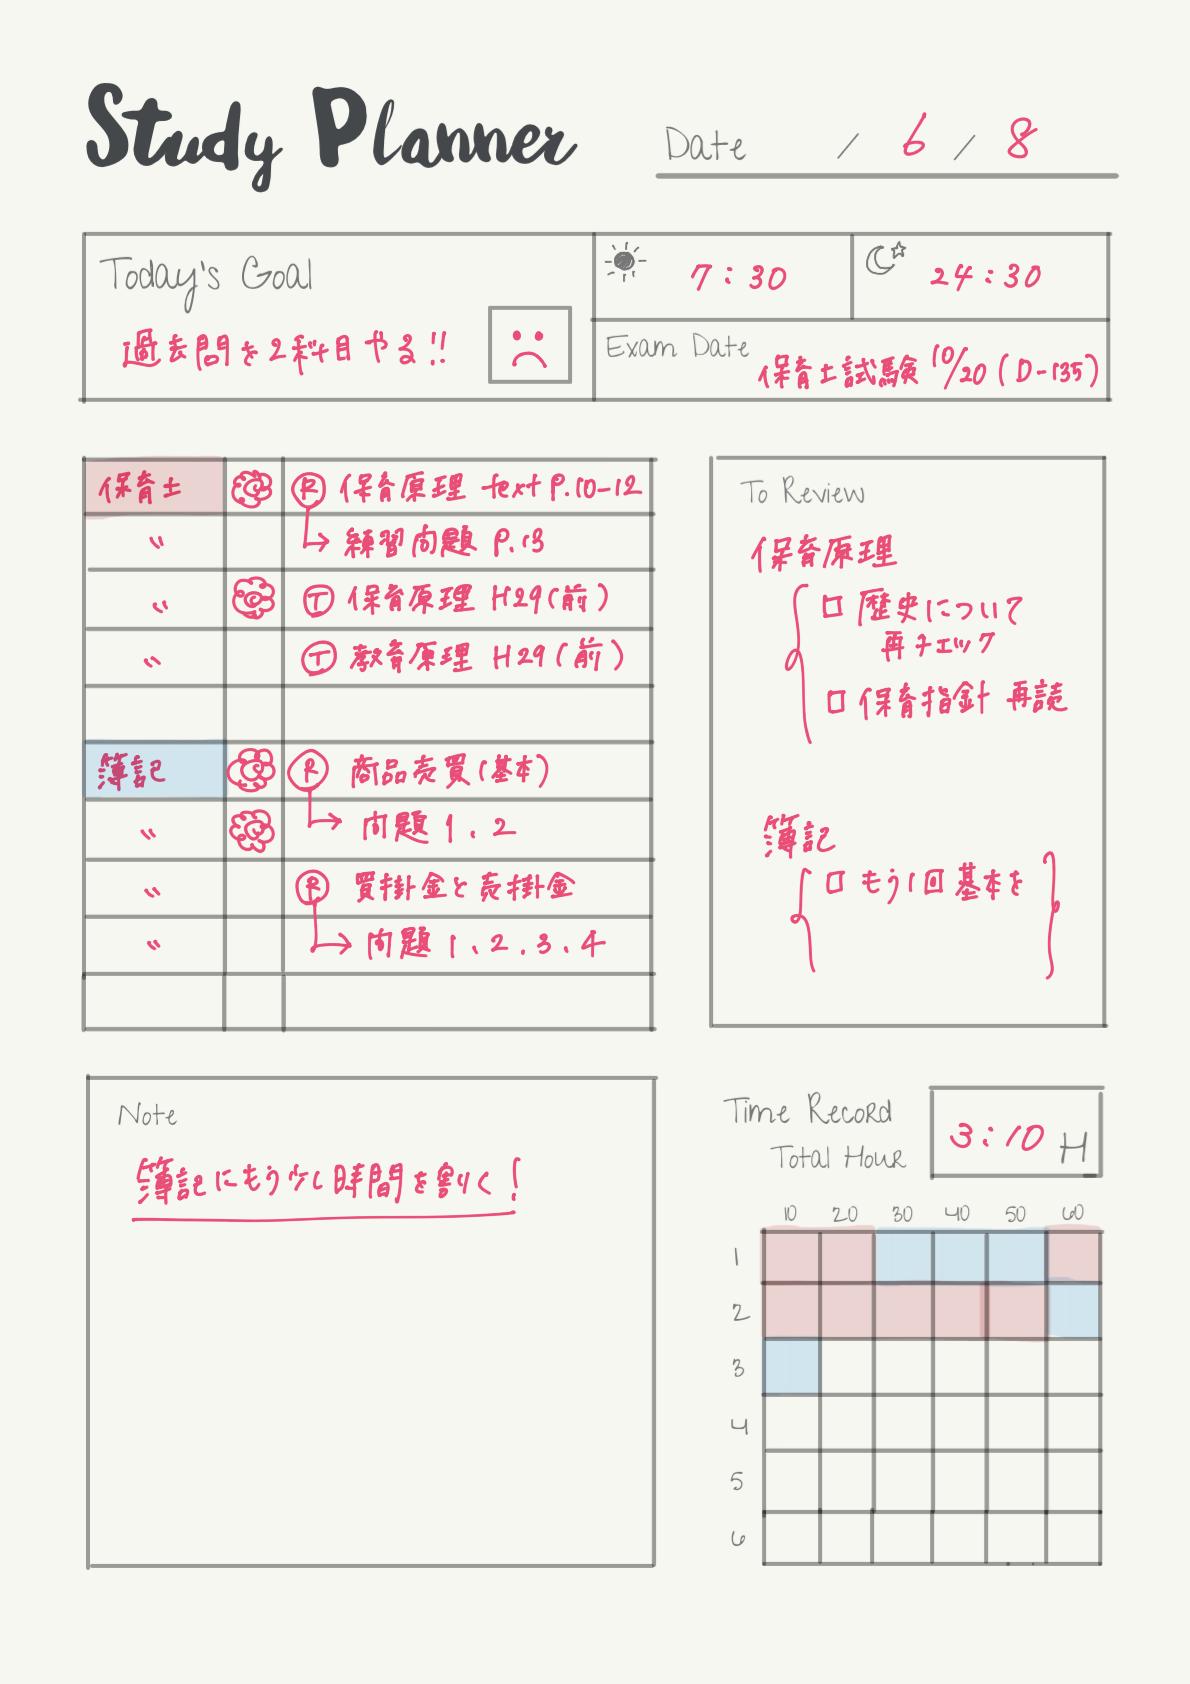 studyplanner-example